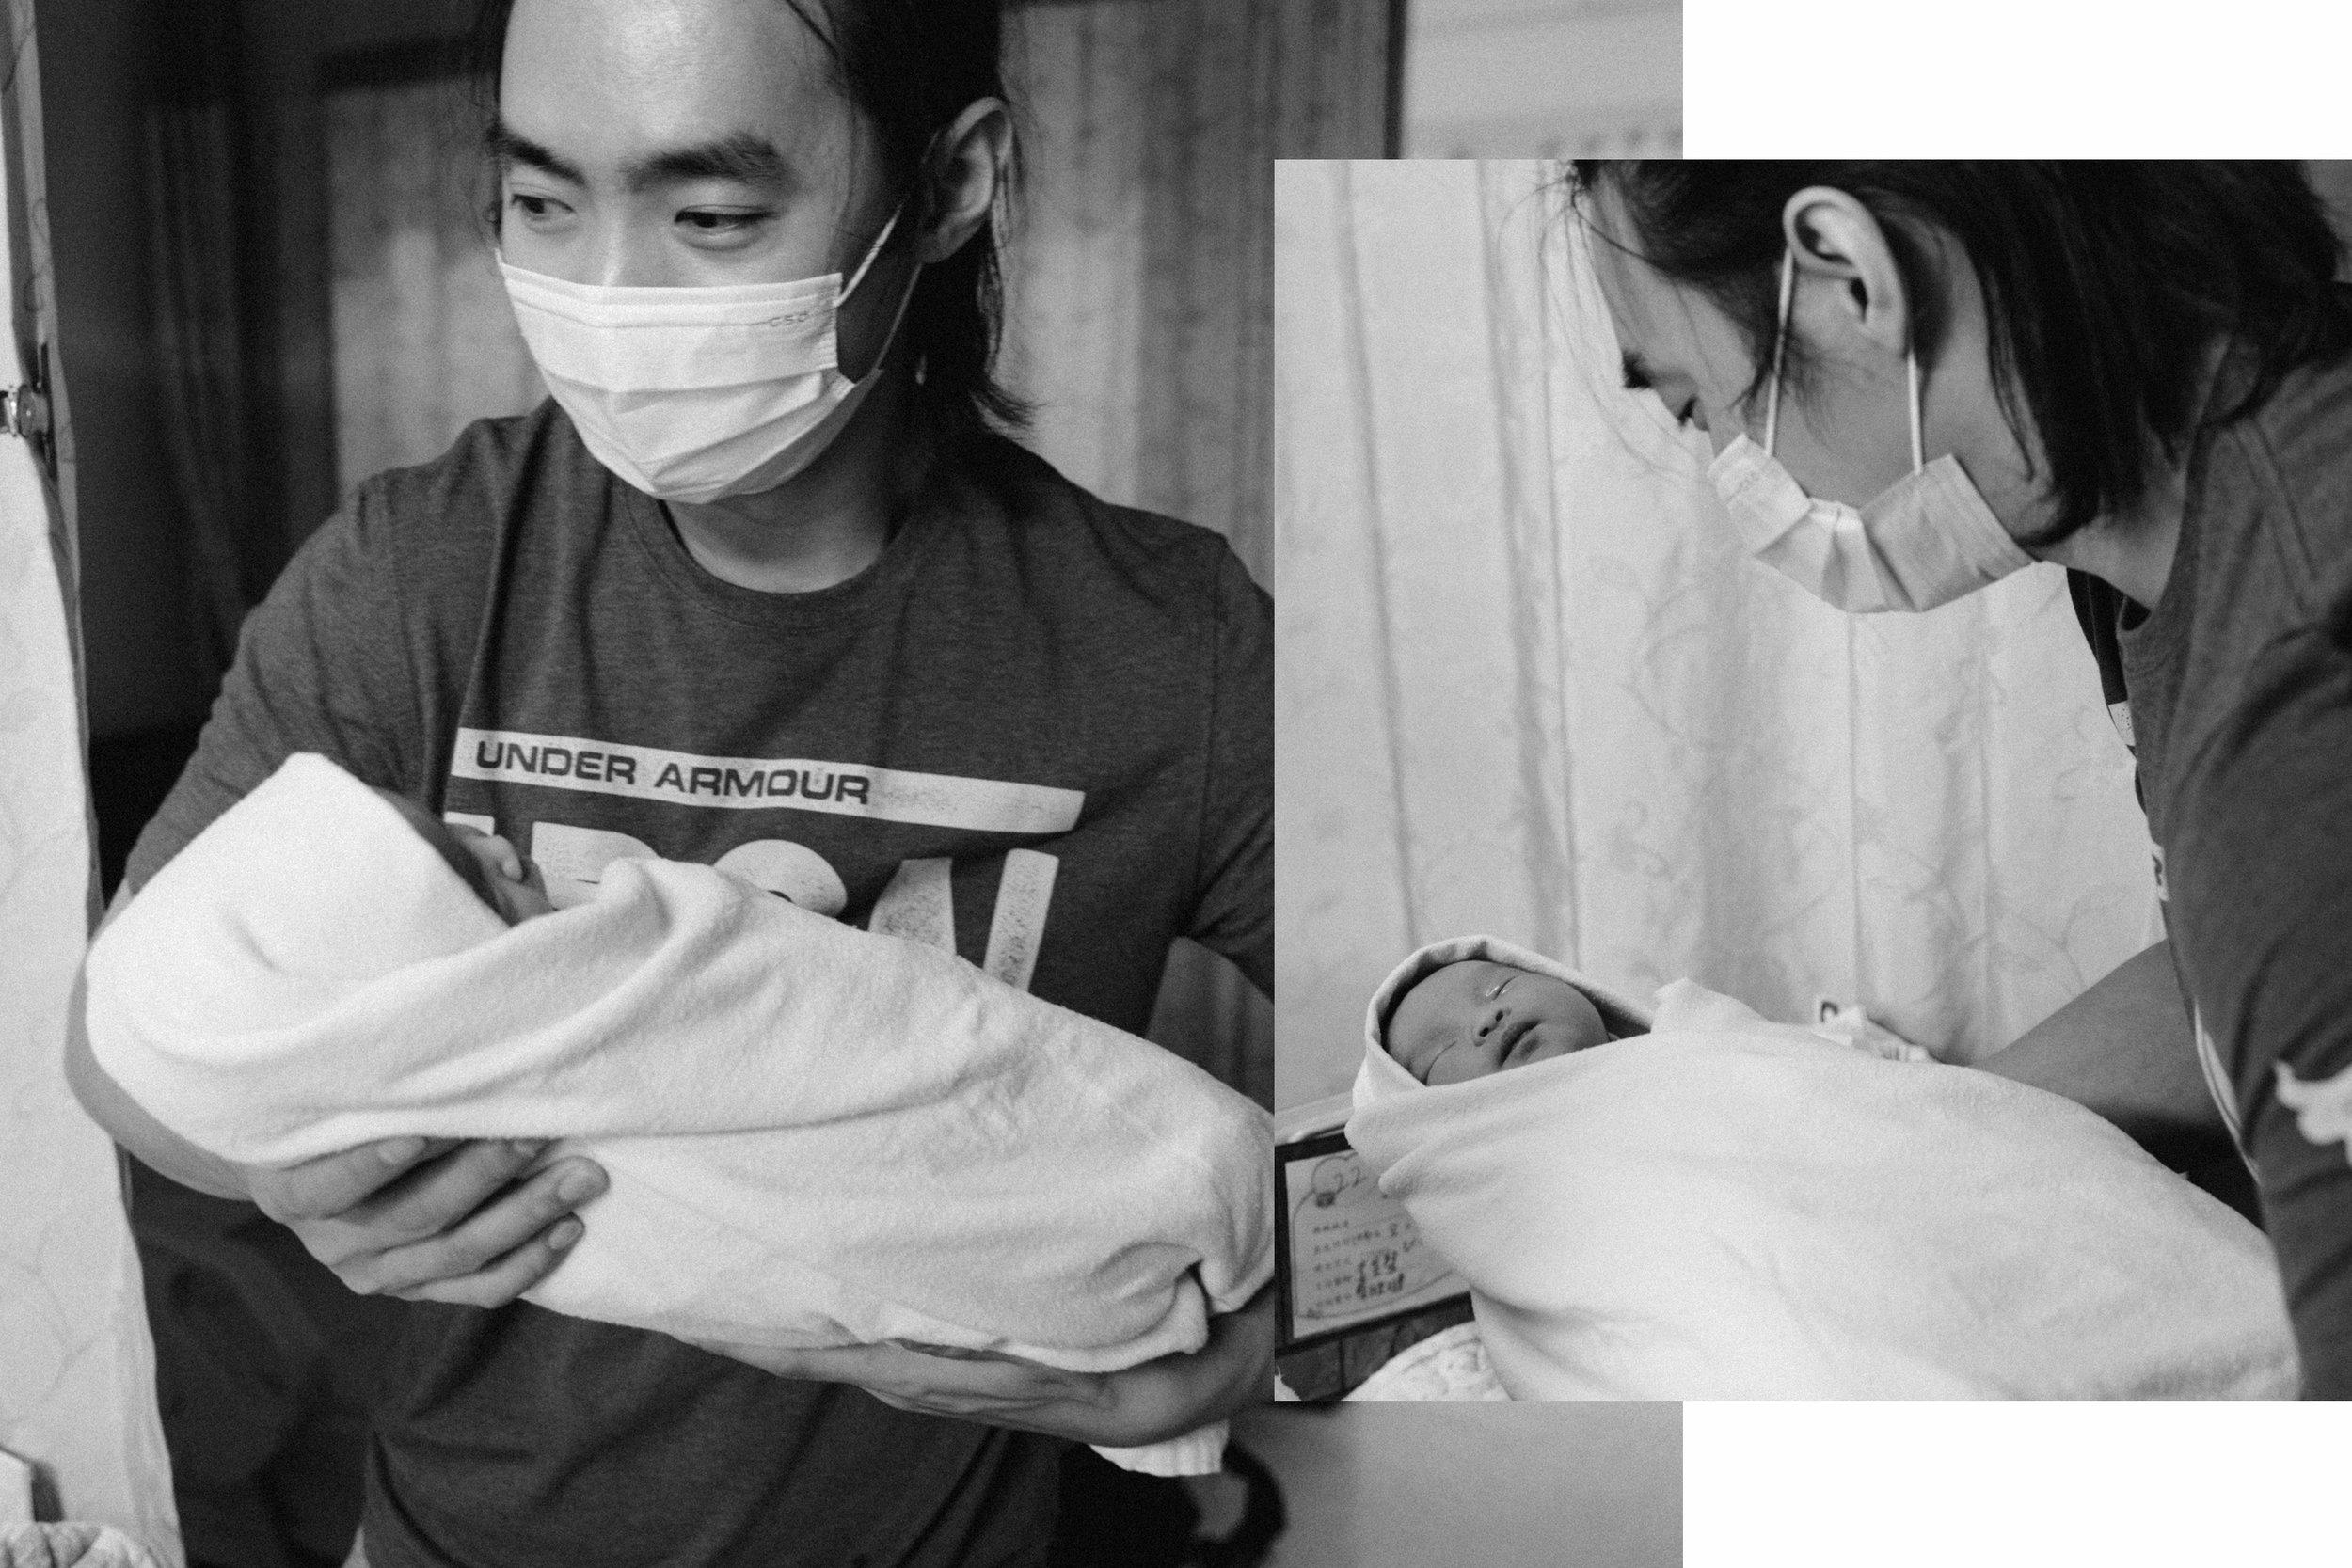 star-ken-firstday-newborn-baby-taipei-台北榮總-46.jpg